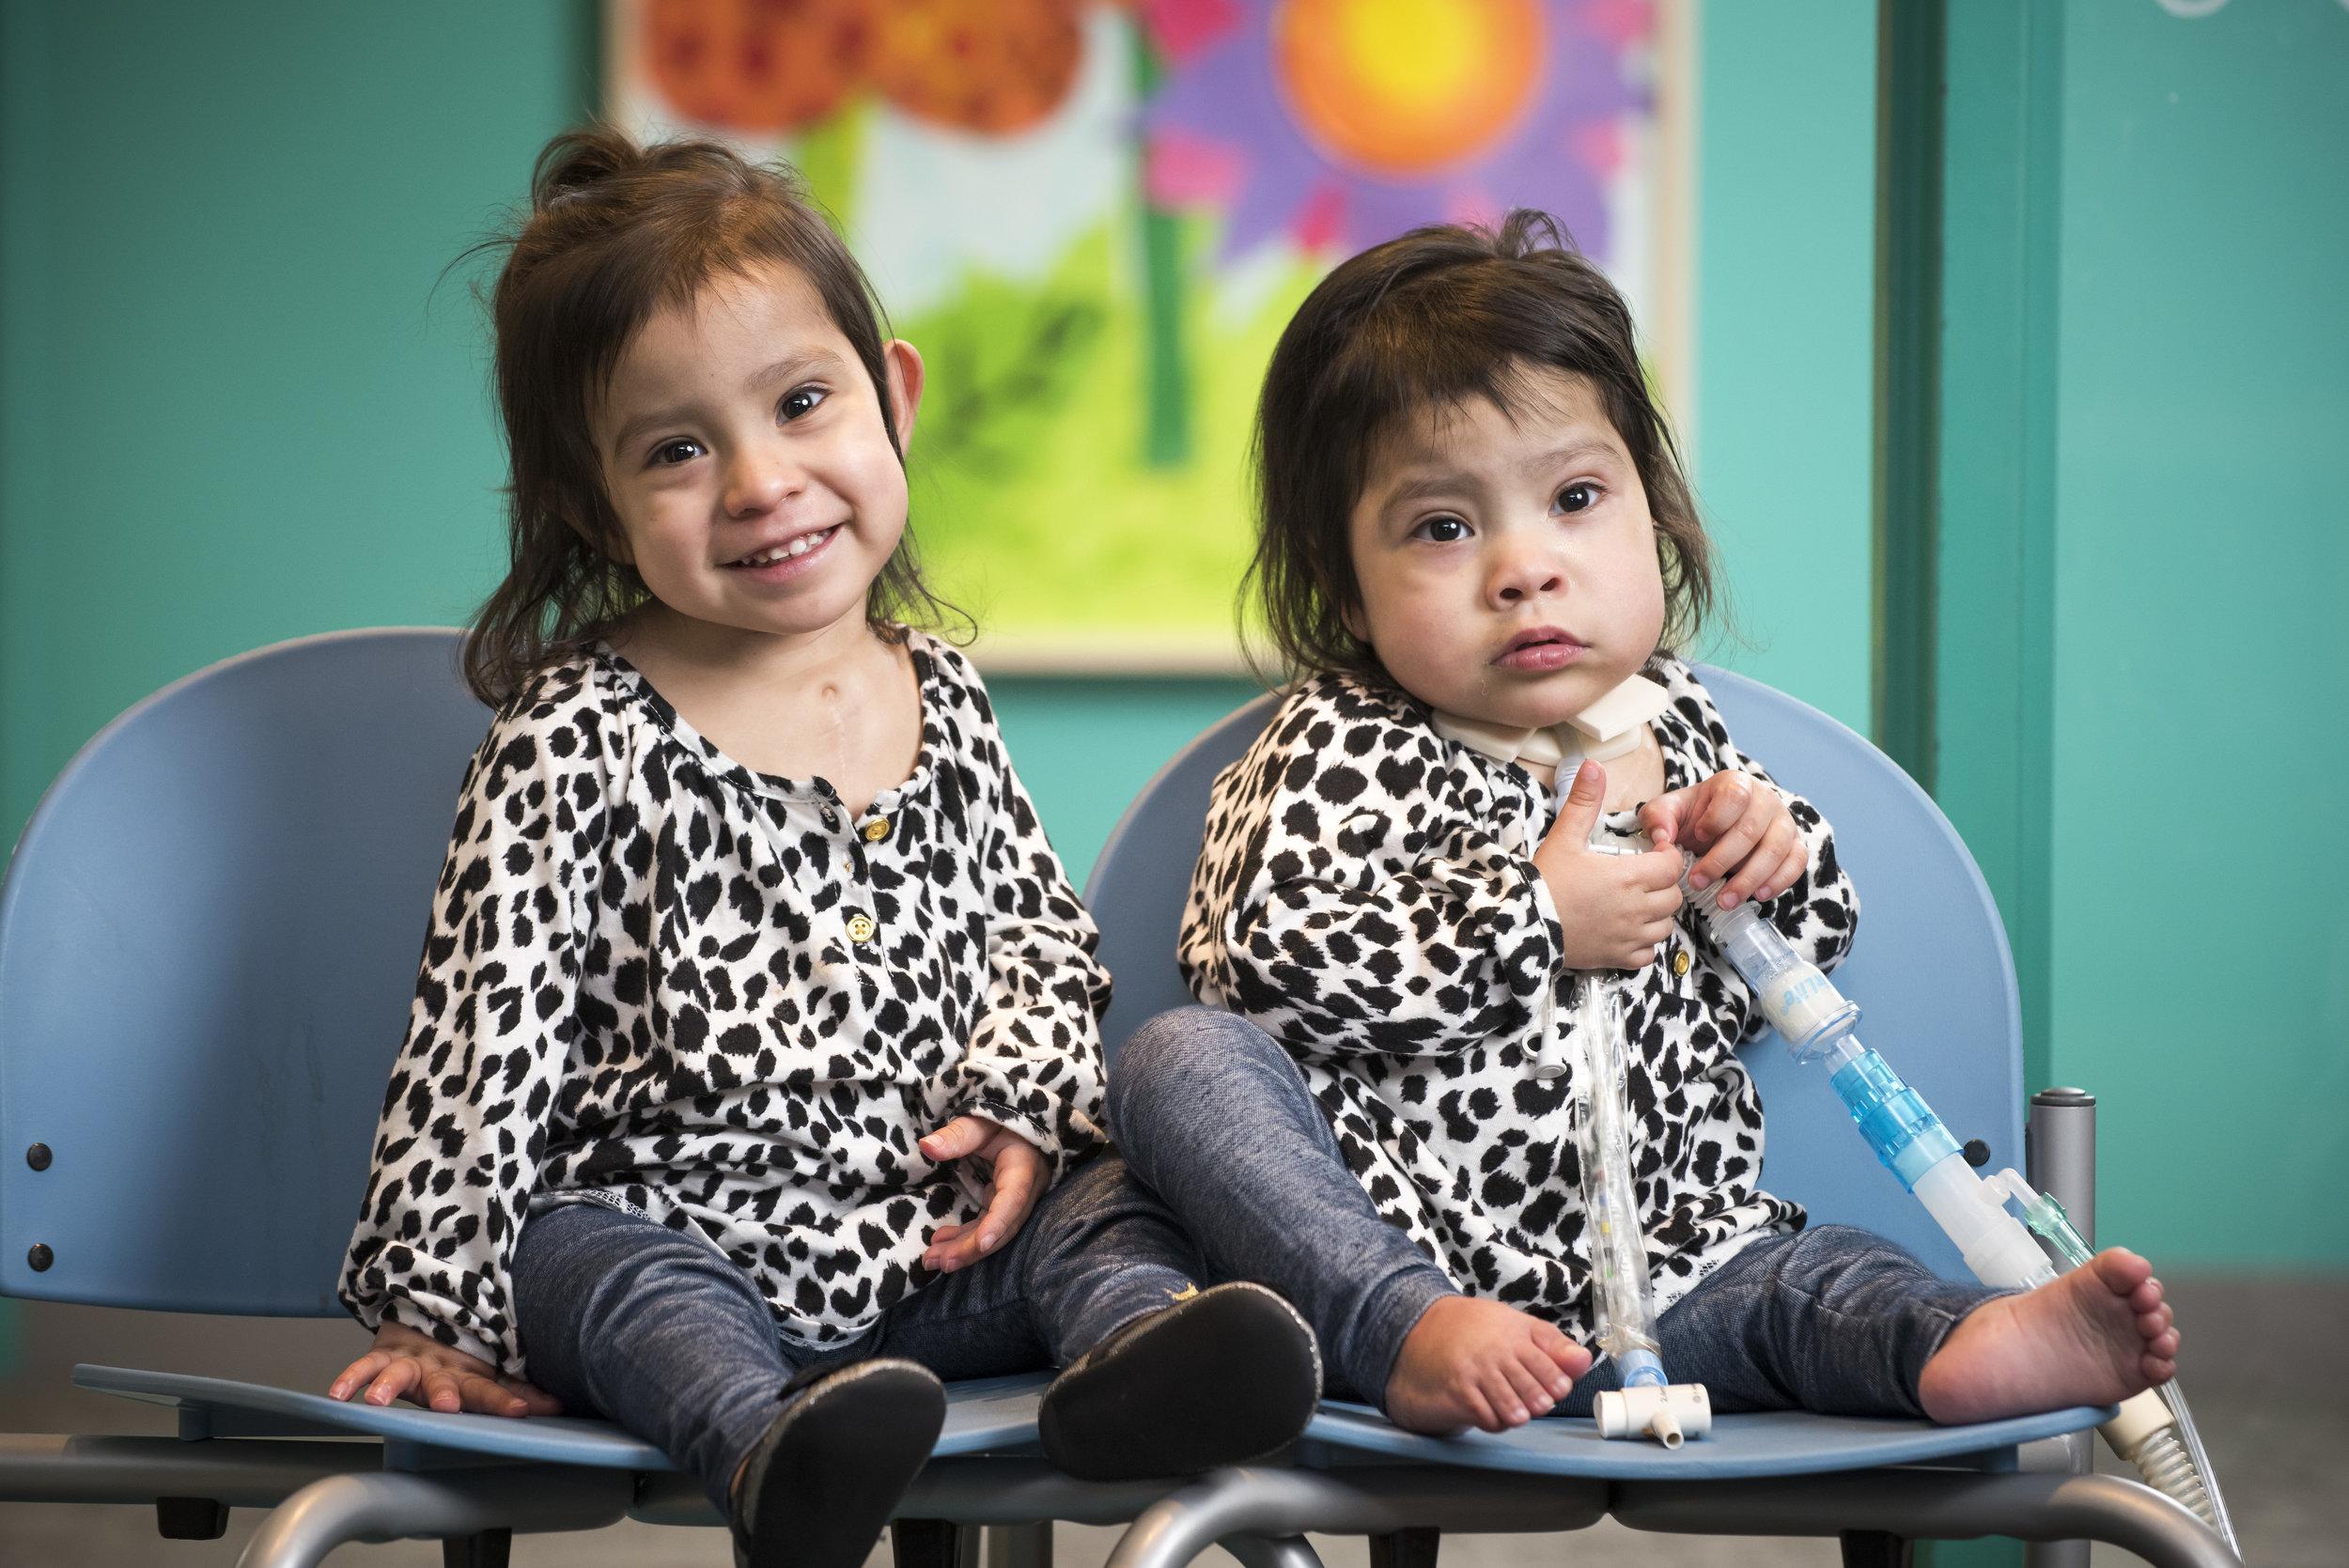 2k16-0028-AK4_9394Mata Family clinic visit 1-15-16.jpg